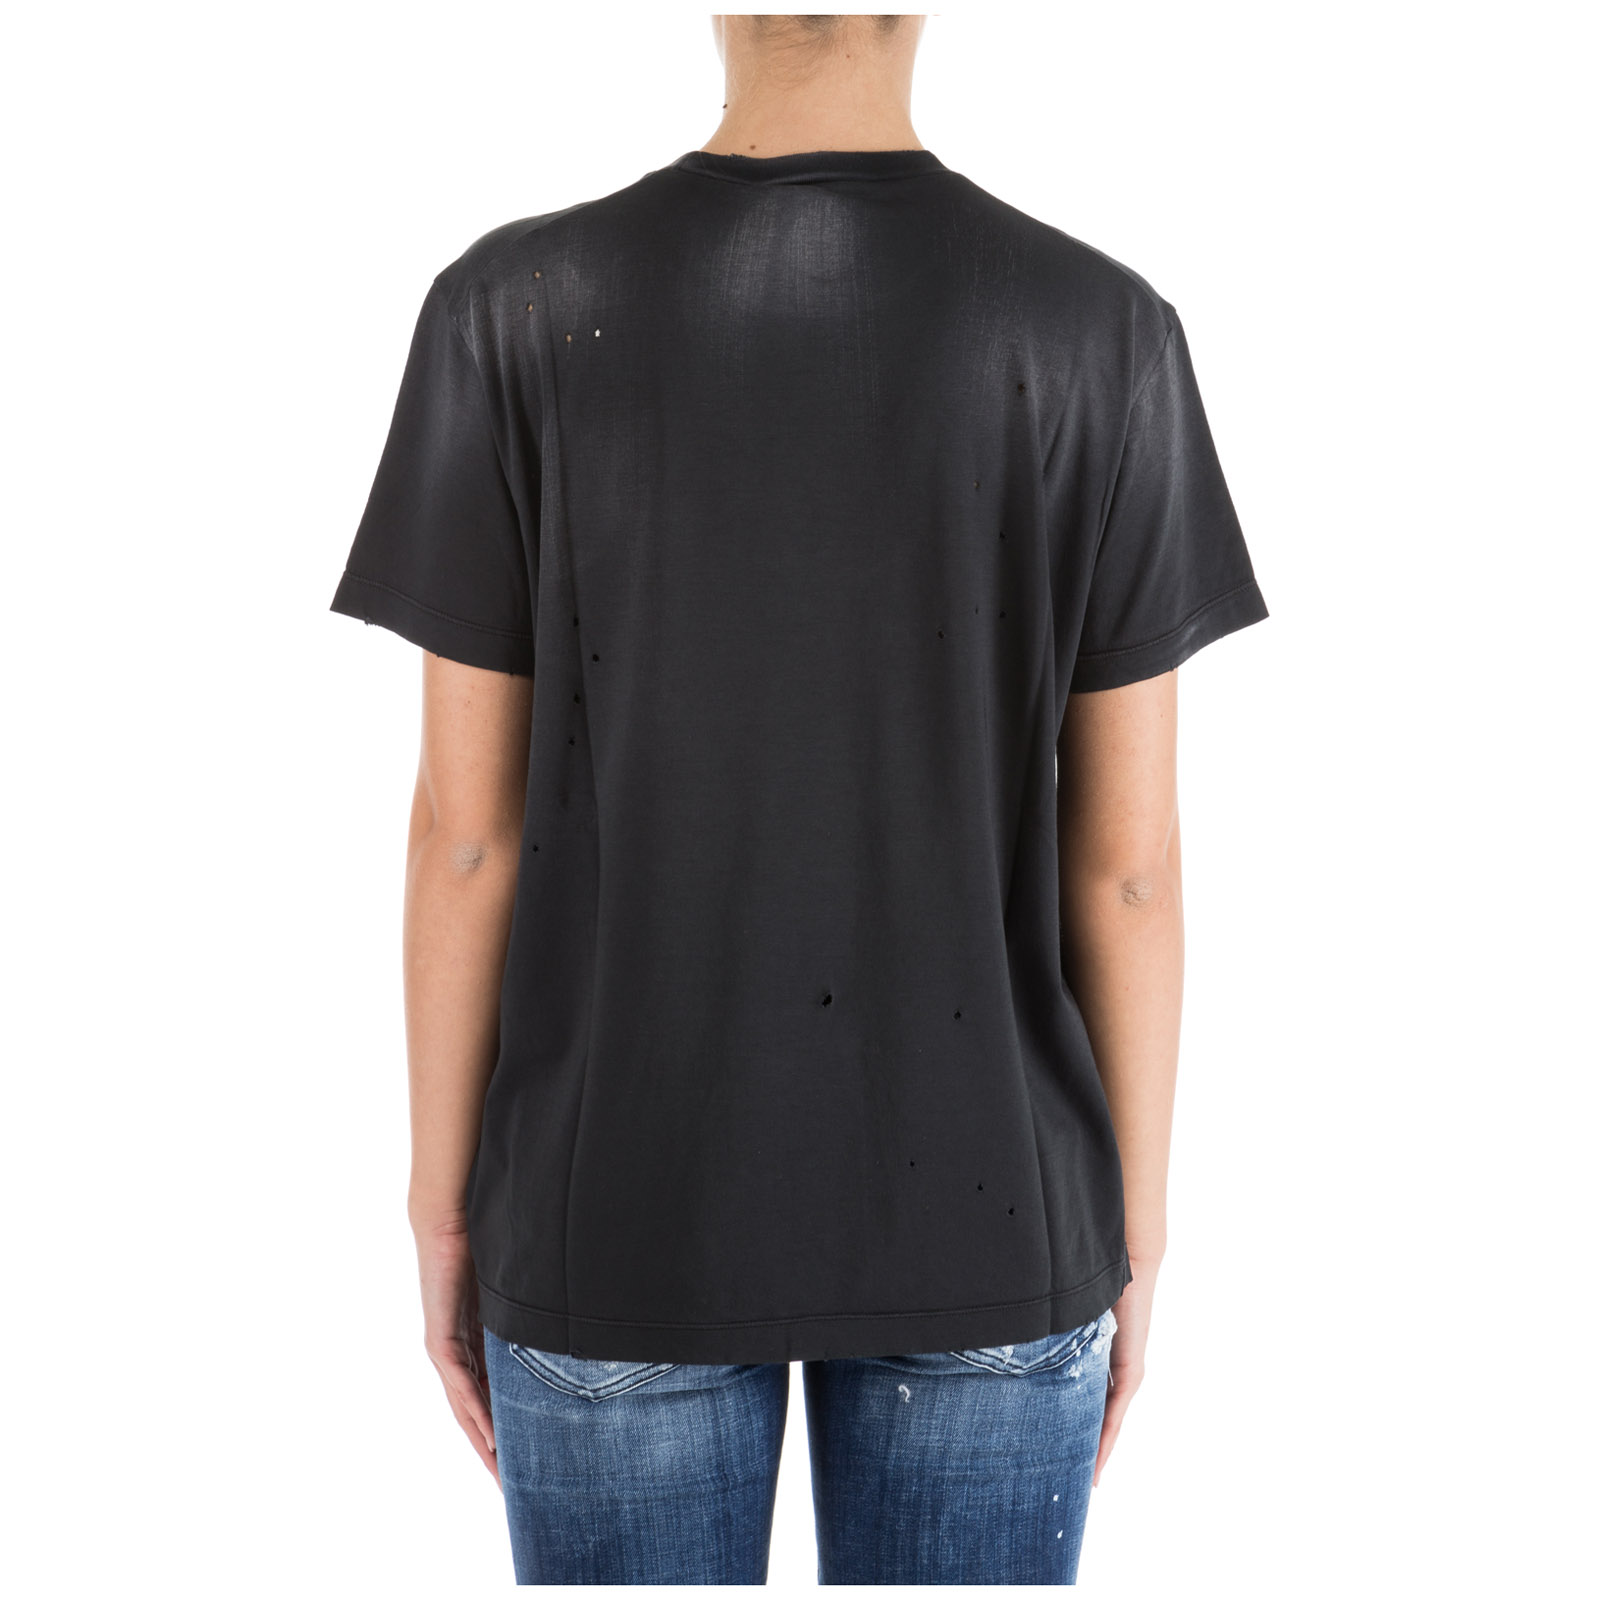 Women's t-shirt short sleeve crew neck round vicious bros